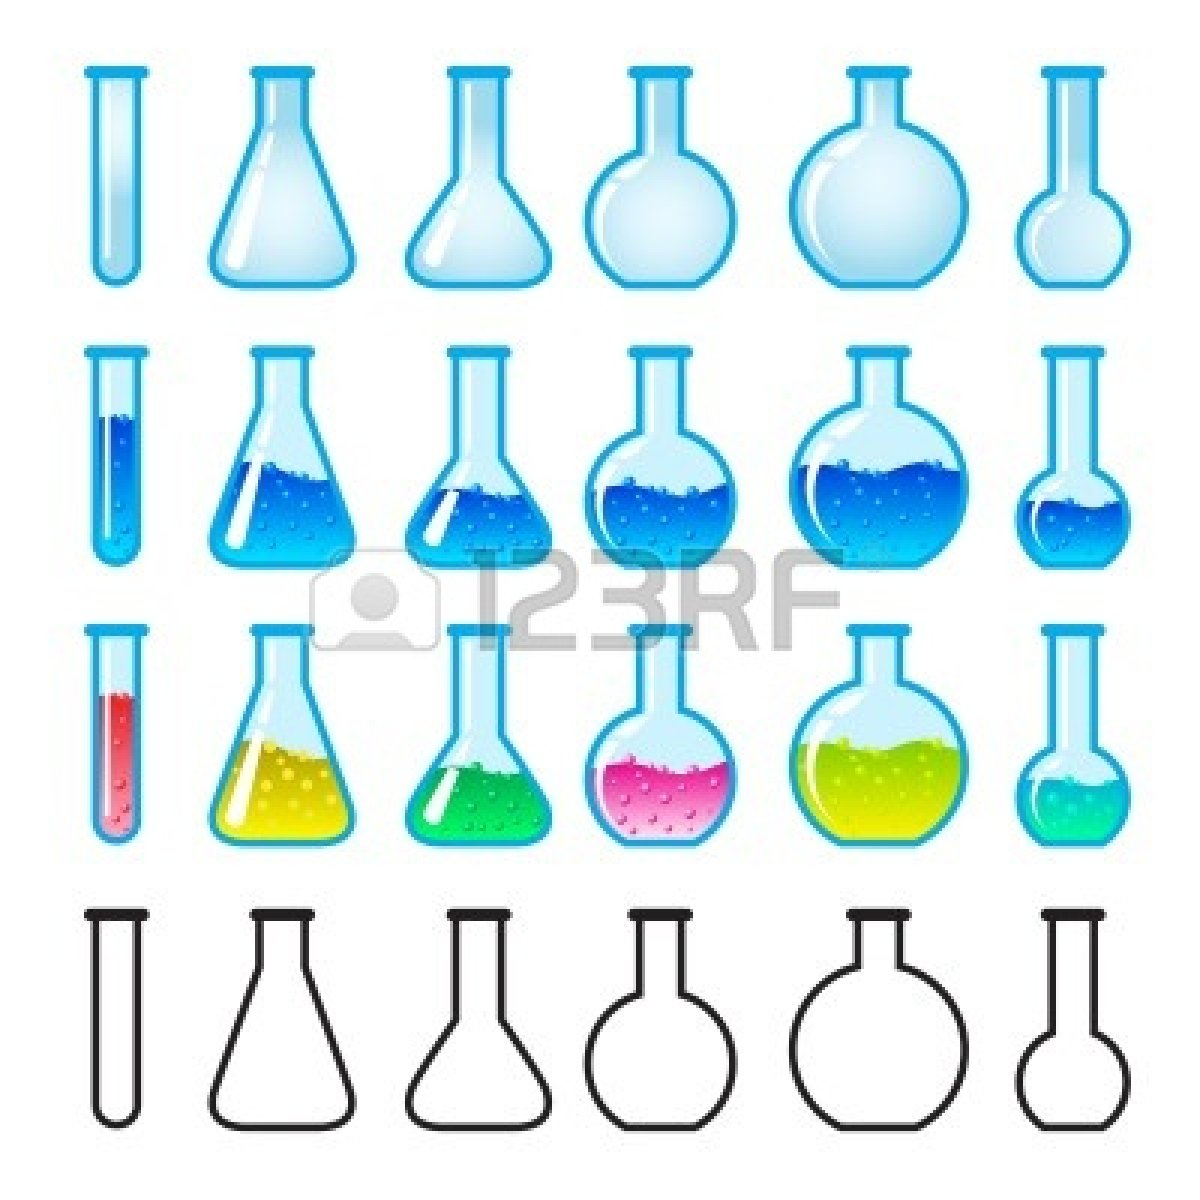 Laboratory clipart lab glassware Free Lab Images Chemistry Panda